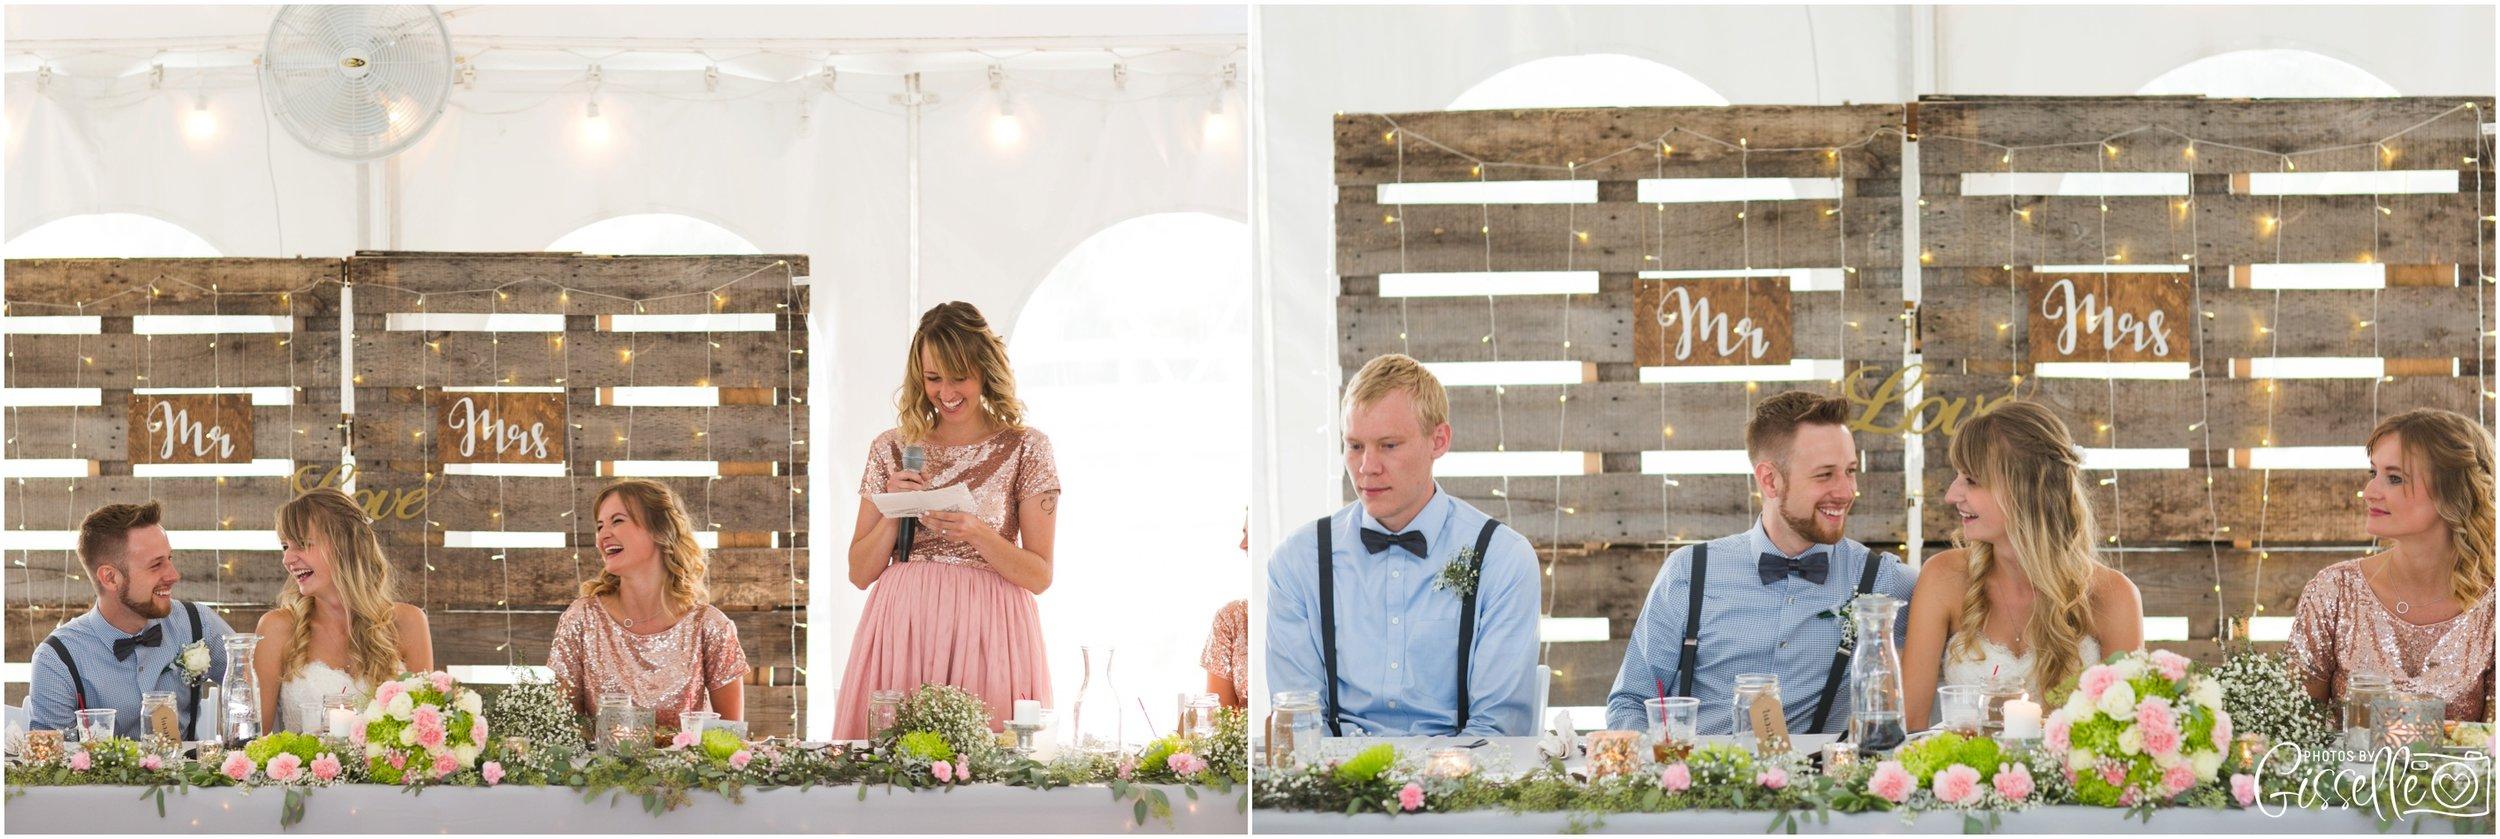 Northfork Farm Wedding_0415.jpg